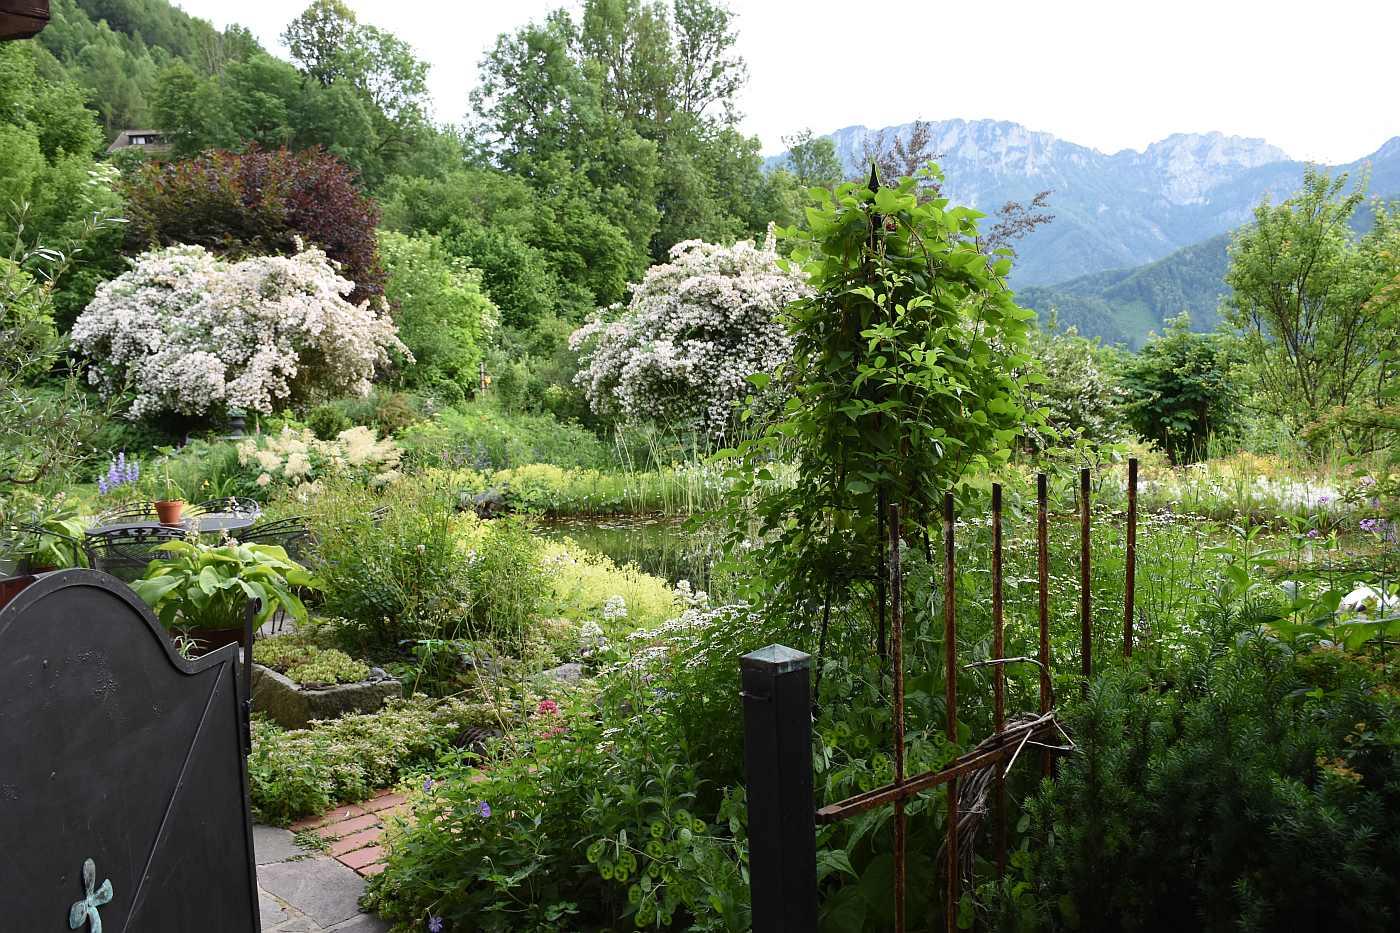 Garten der Leidenschaften